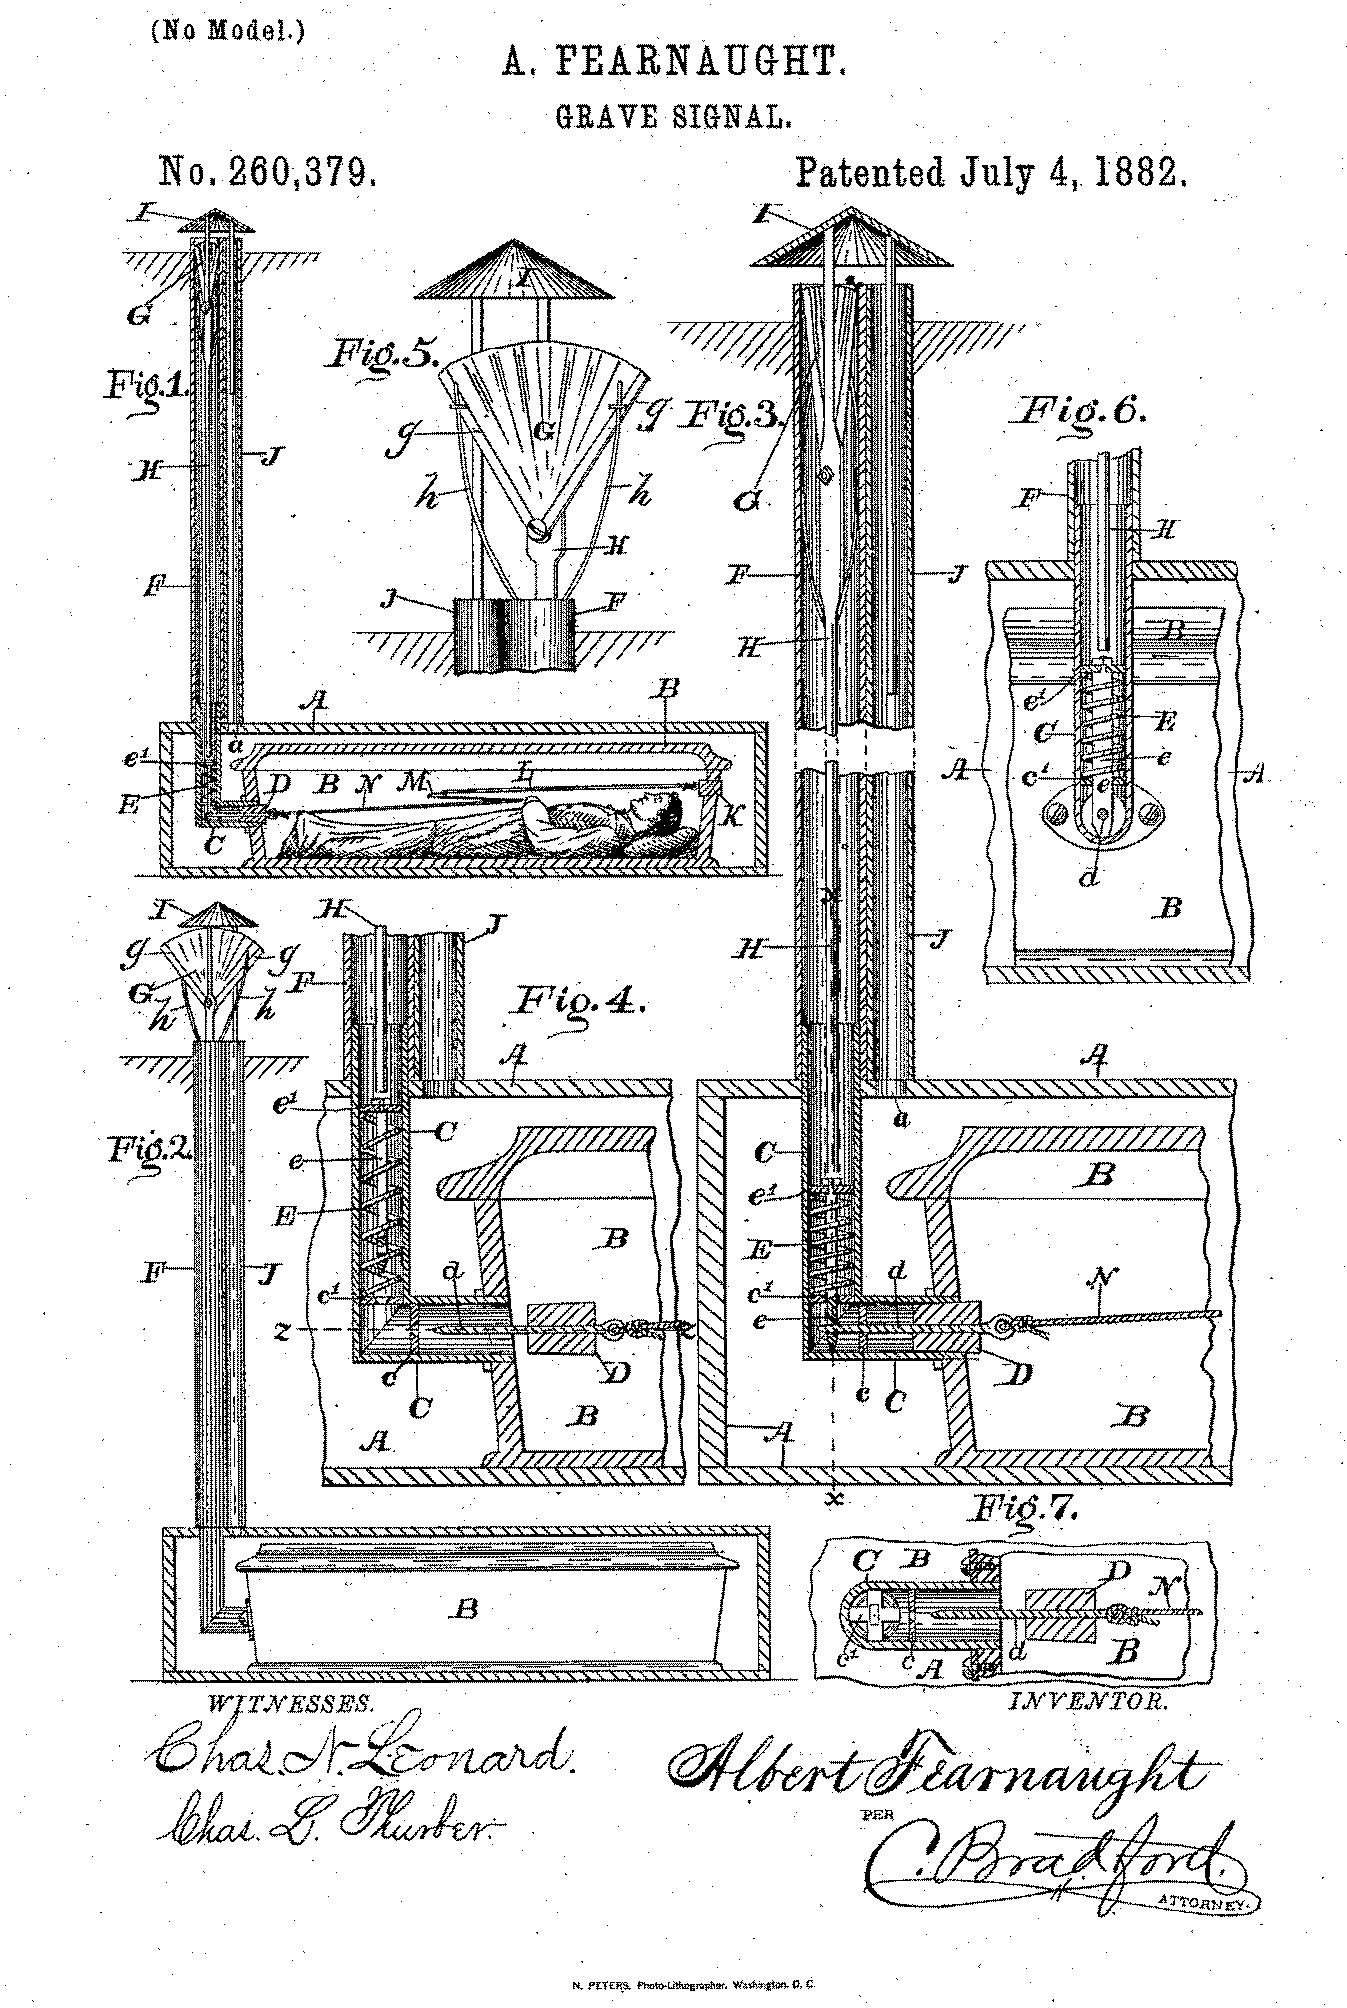 GraveSignal_Patent